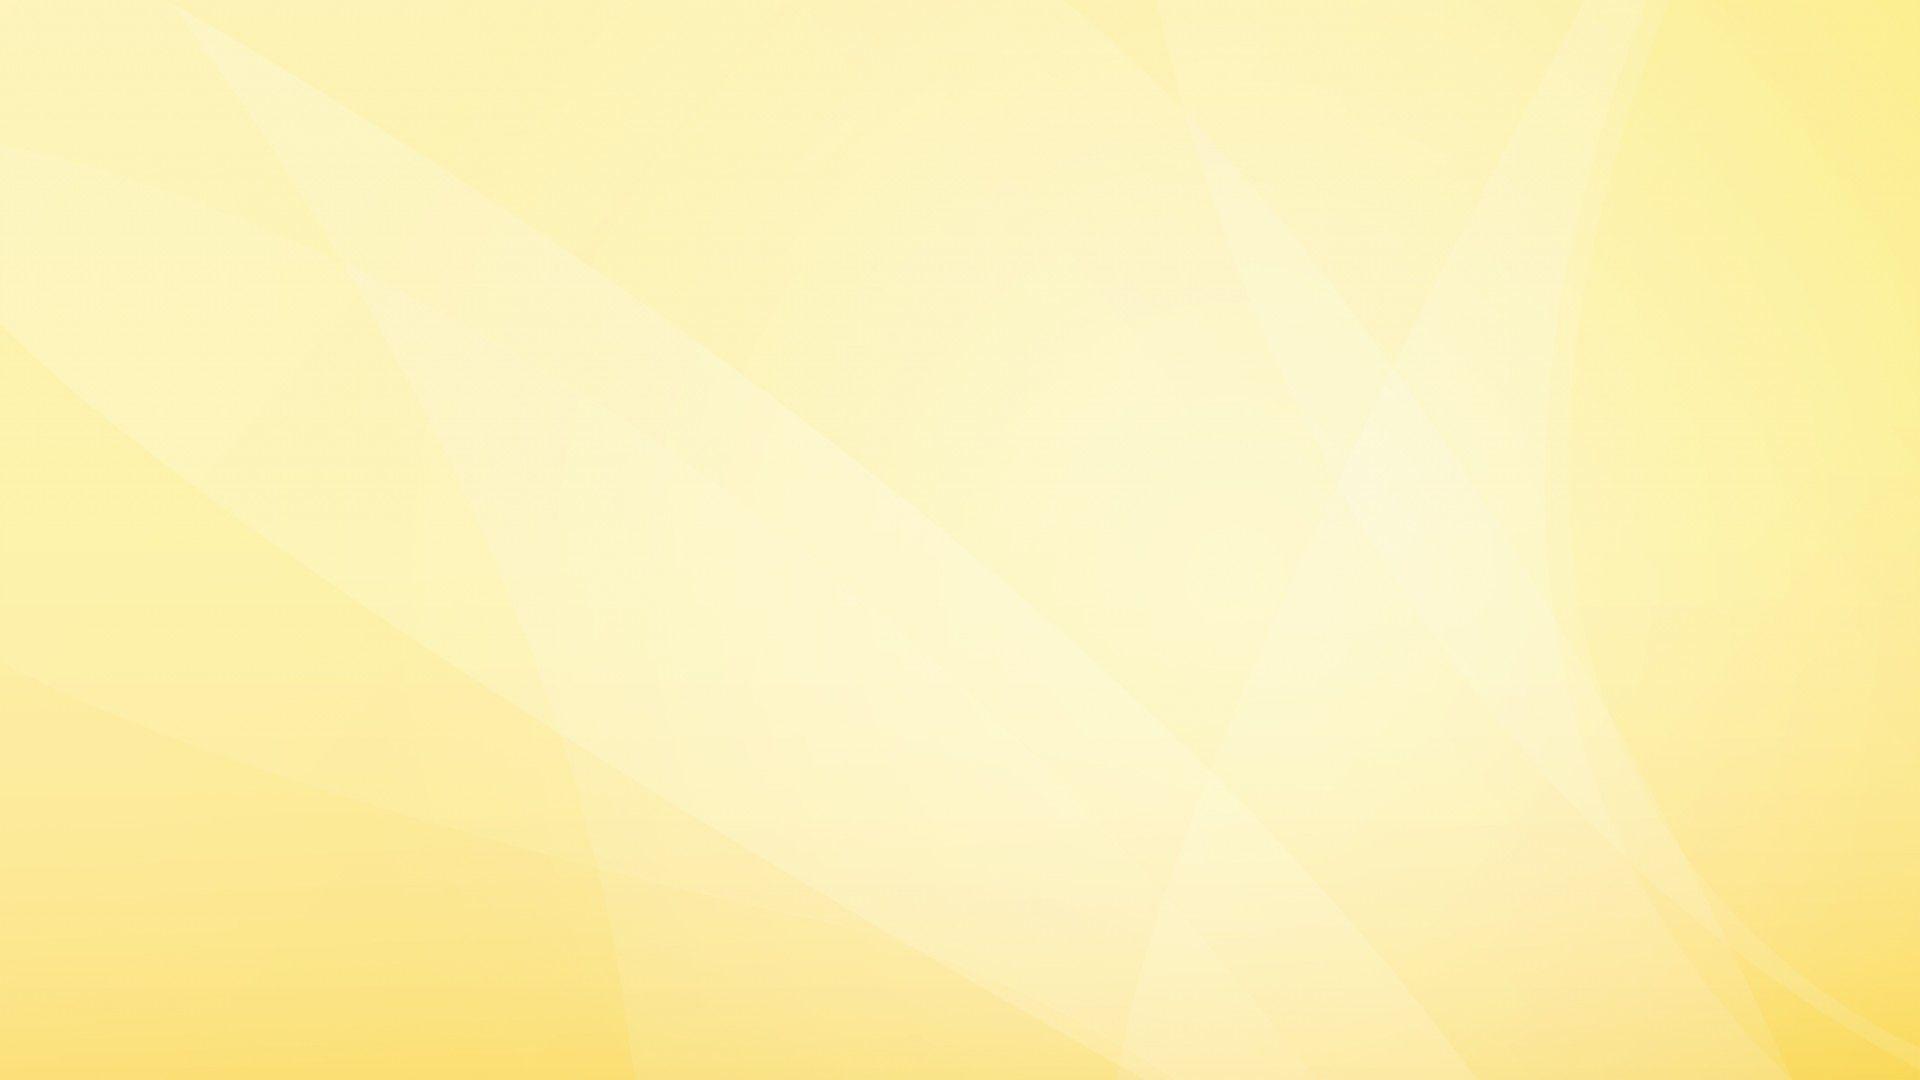 Wallpaper iphone kuning - Best Iphone Wallpaper Yellow Ideas On Pinterest Dark Phone